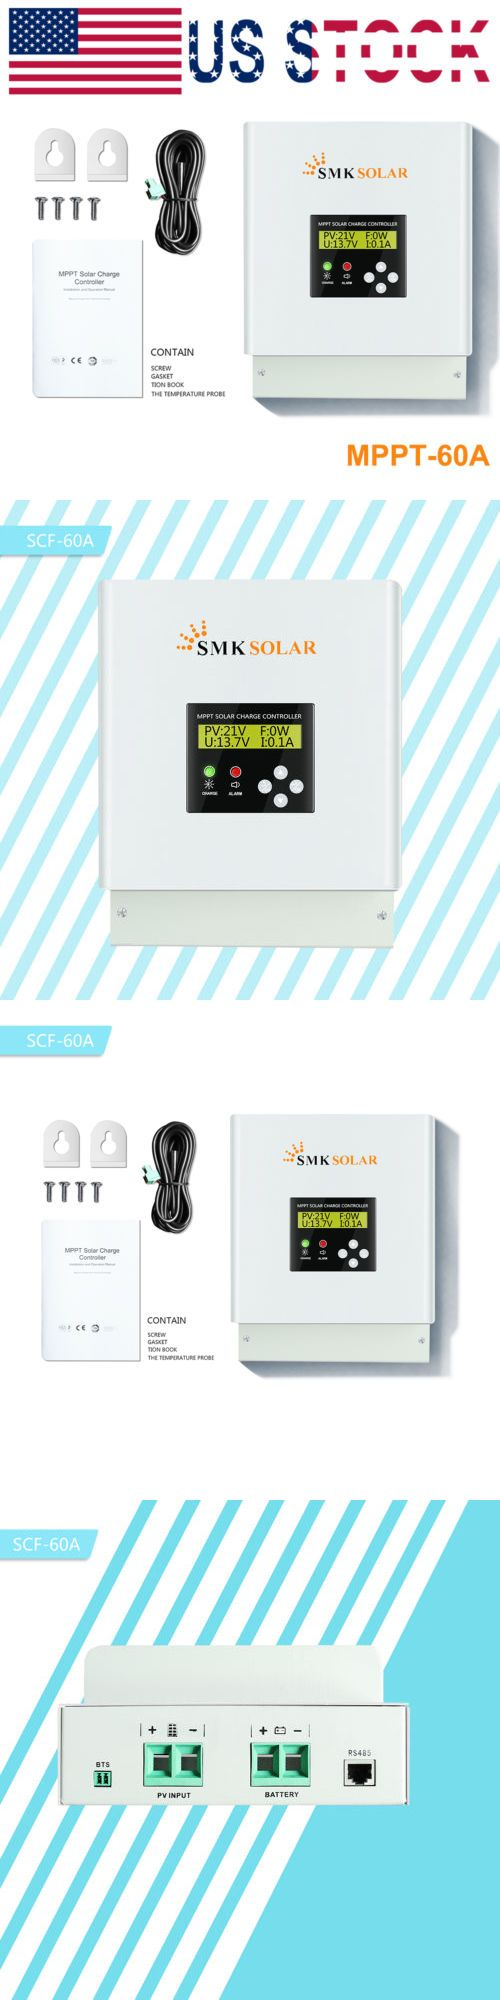 Home Improvement 60a Mppt Solar Charge Controller 12 24 36 48v Auto 100v Fan Cooling Controller Alternative & Solar Energy